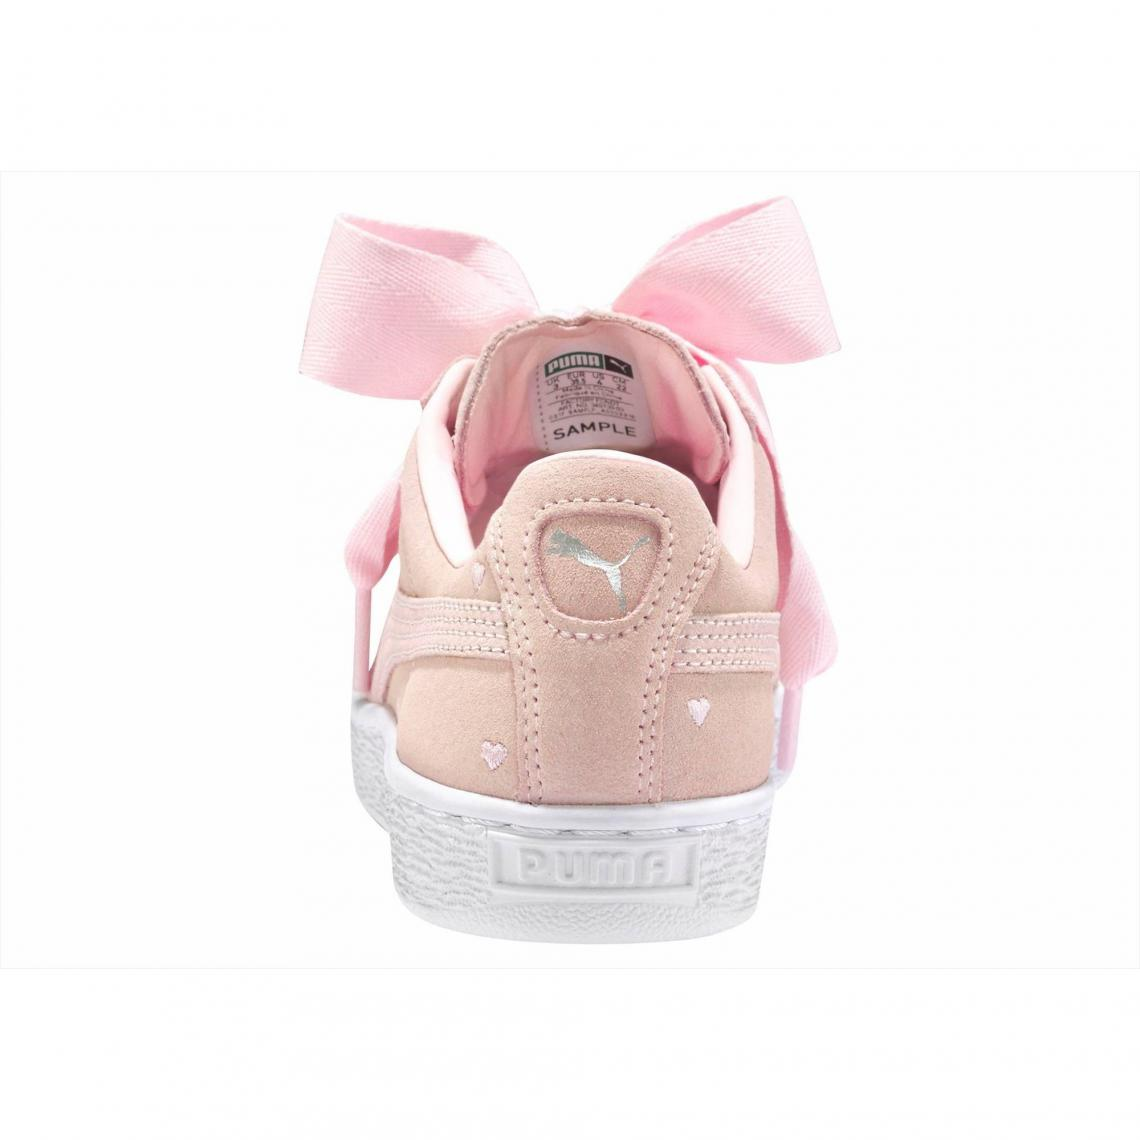 Fille Valentine Chaussures Sport De Blanc Rosé Heart Puma Suede 4TEZpEqw